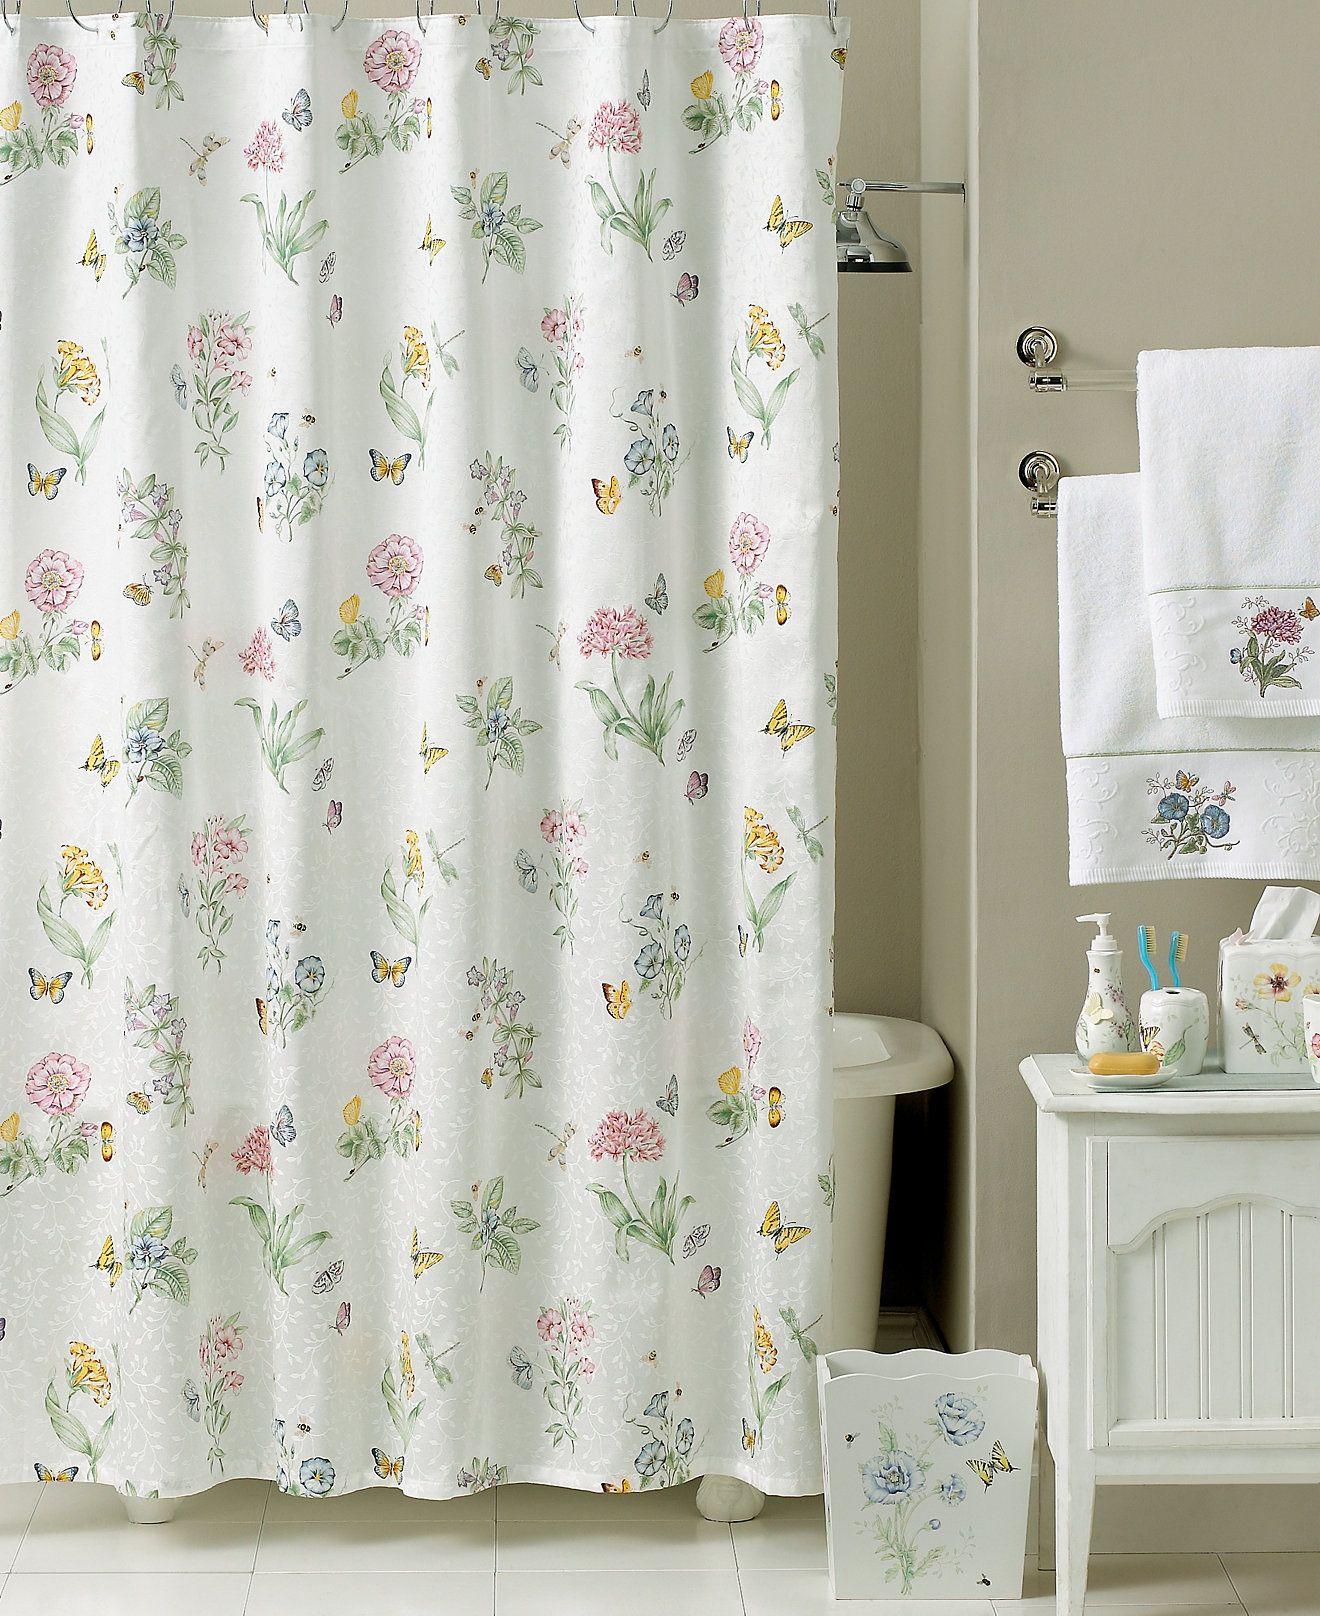 Lenox Bath Accessories Butterfly Meadow Shower Curtain Shower